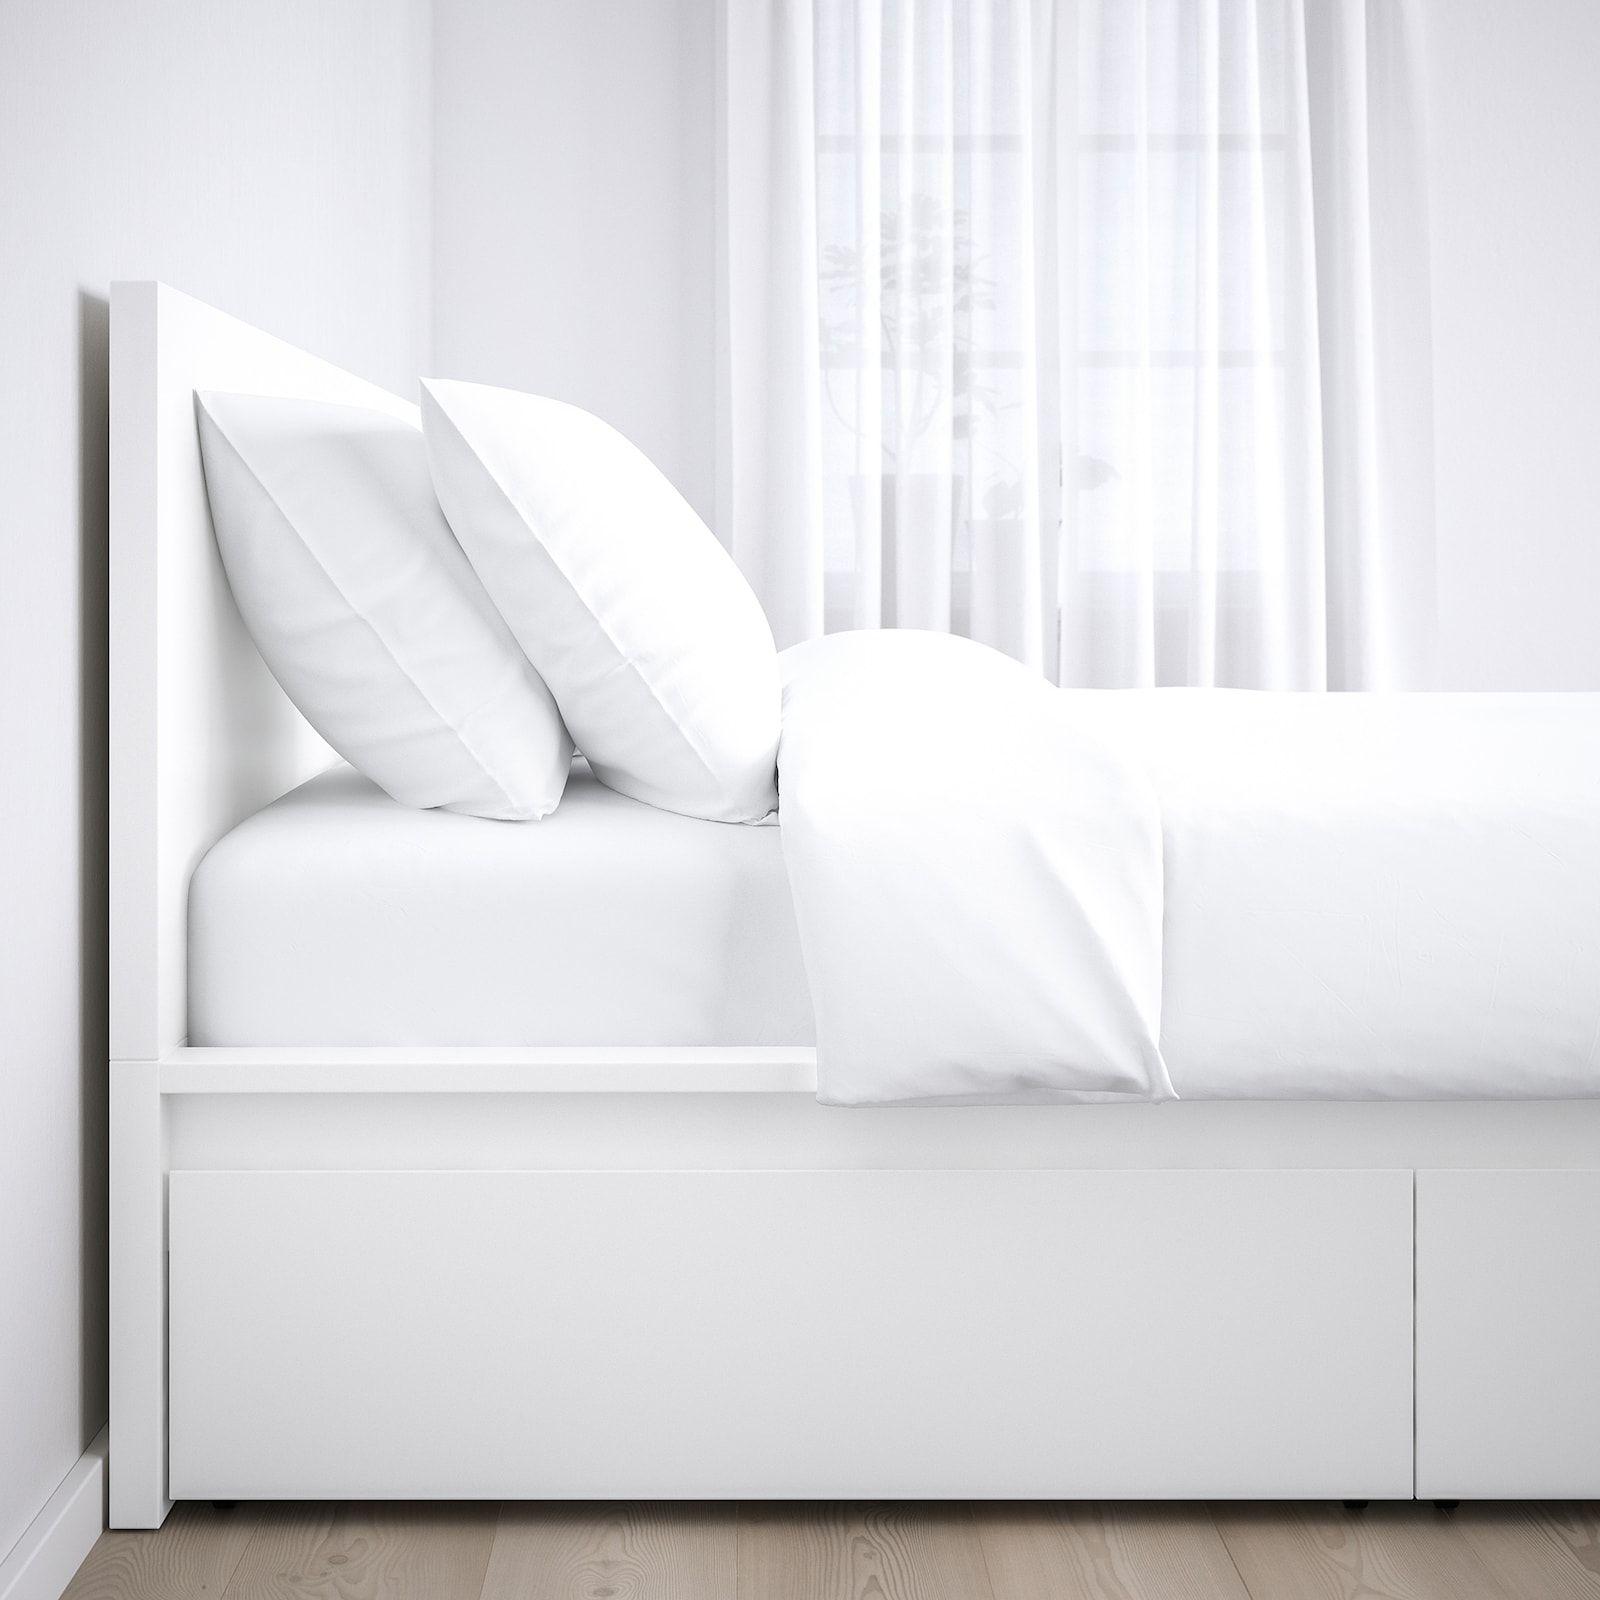 Malm Bedframe Hoog Met 2 Bedlades Wit Lonset 90x200 Cm In 2020 Hoge Bedden Lattenbodems En Bed Met Lades